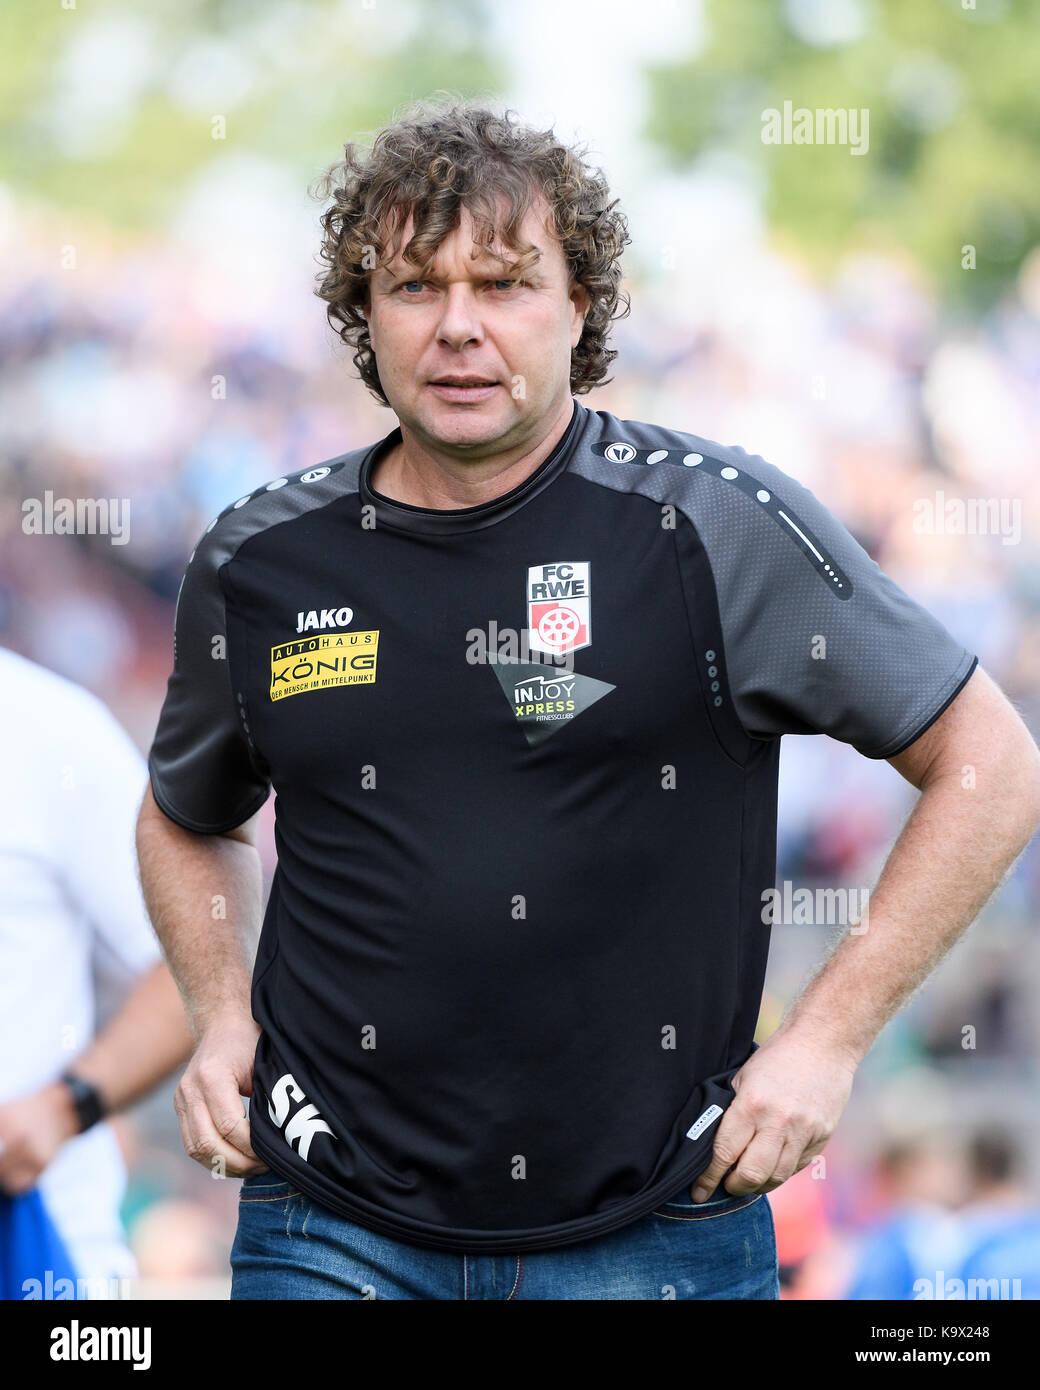 Karlsruhe, Deutschland. 24th Sep, 2017. Trainer Stefan Kraemer (RW). GES/ Fussball/ 3. Liga: Karlsruher SC - FC - Stock Image